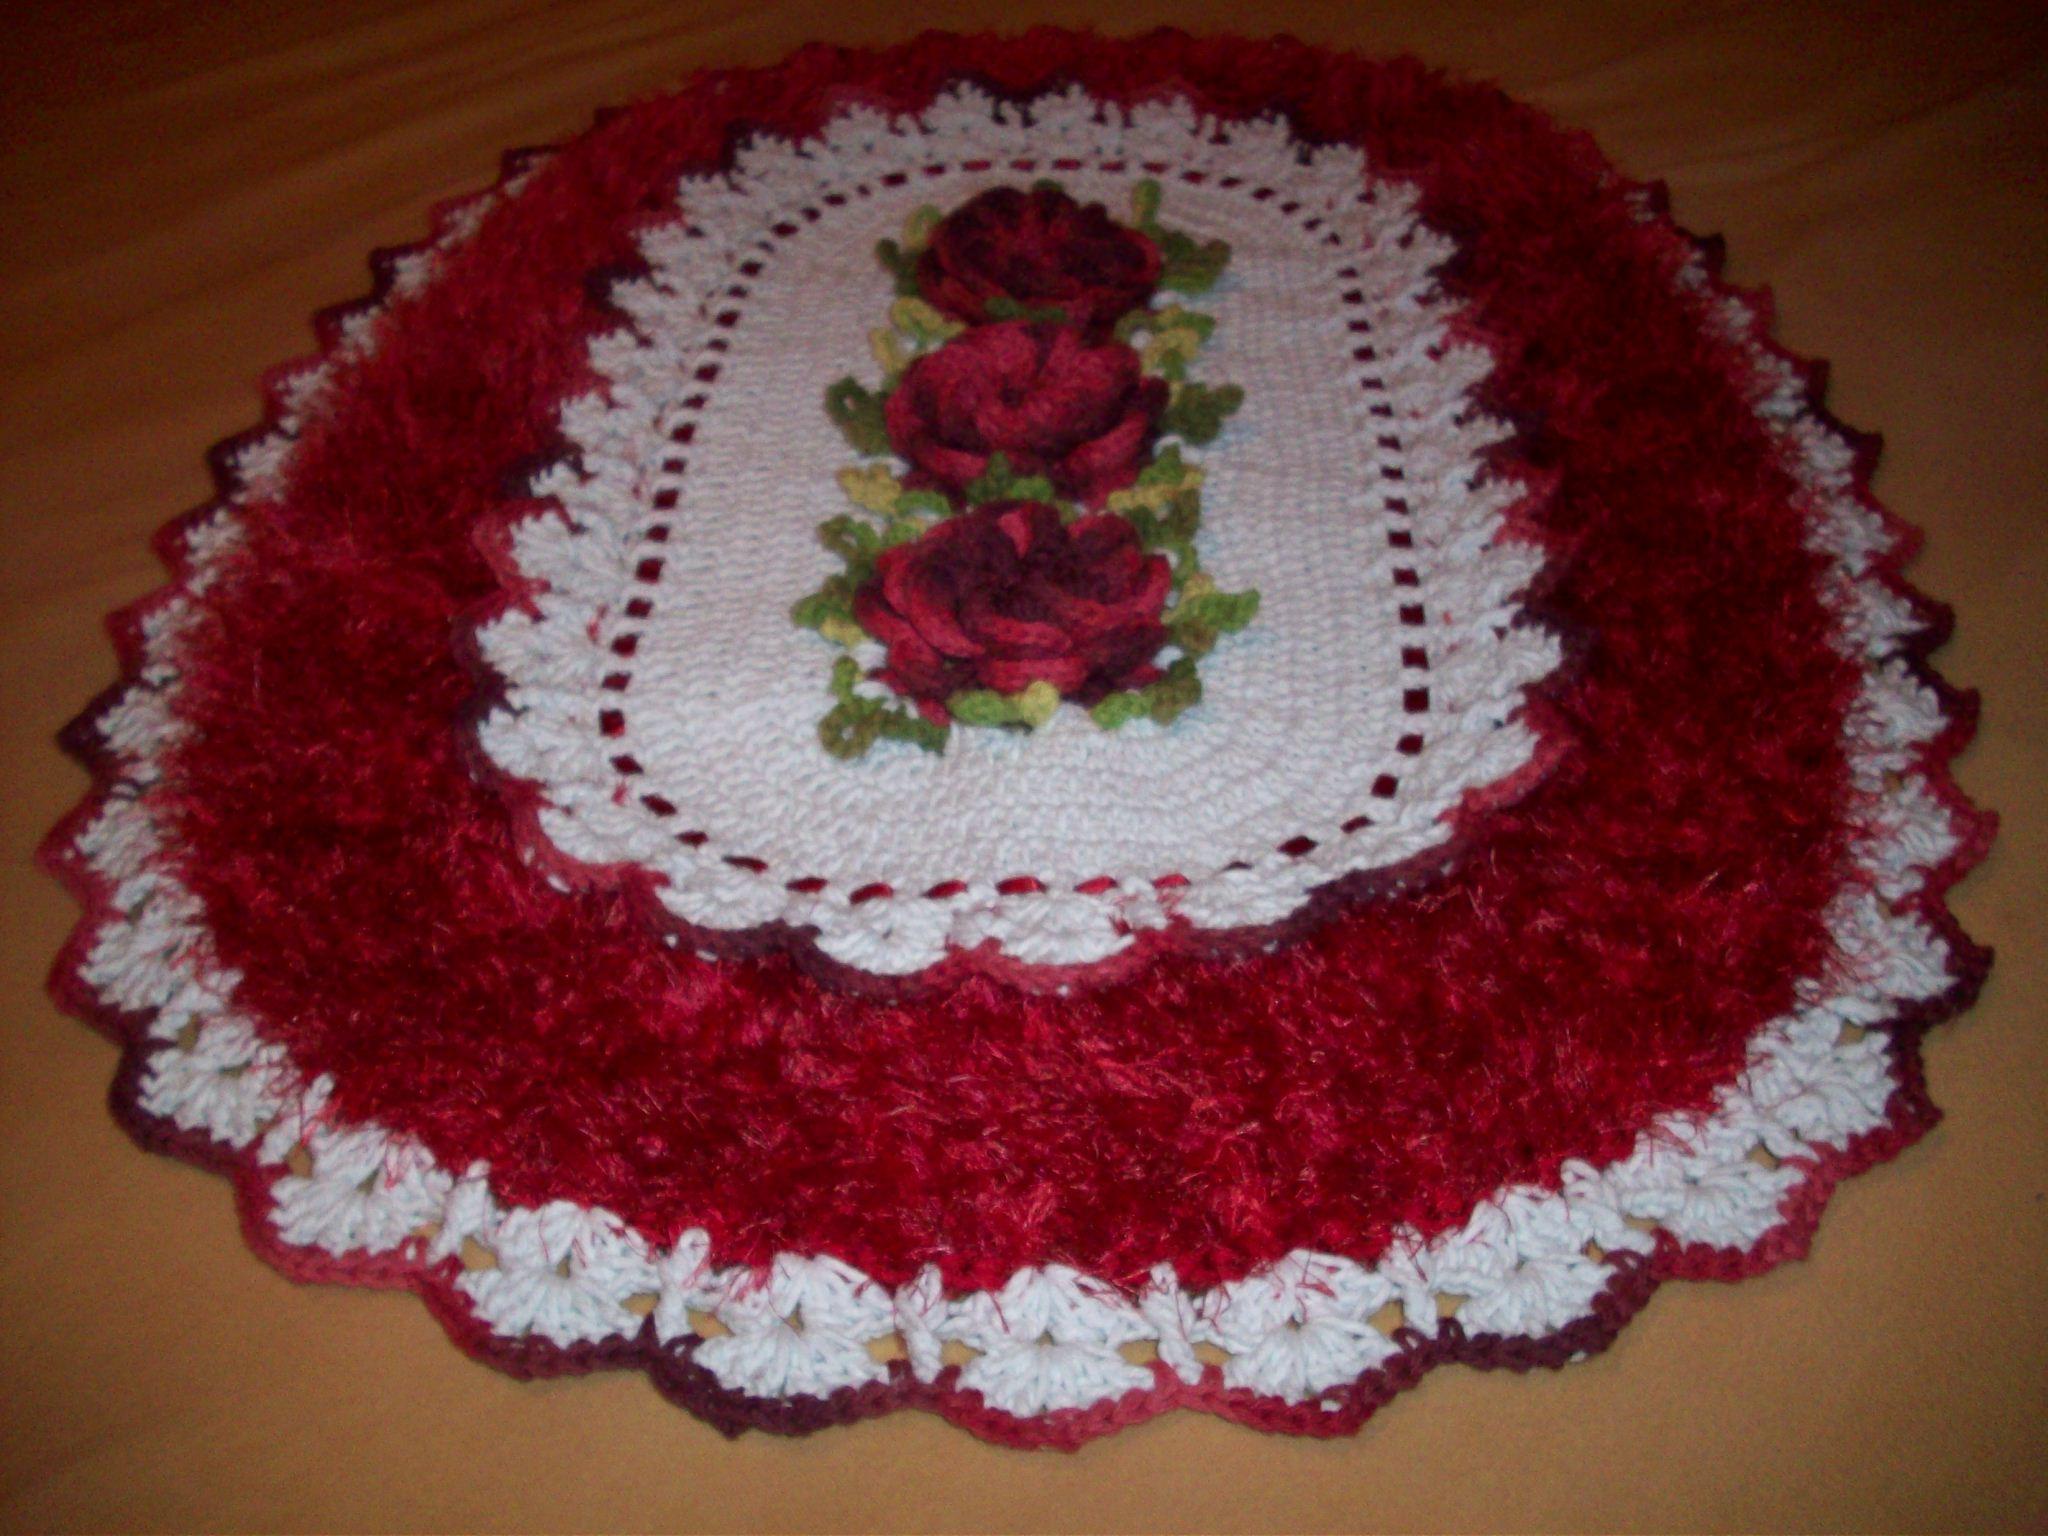 tapete flor caracol com fio peludo ivonete artes em. Black Bedroom Furniture Sets. Home Design Ideas